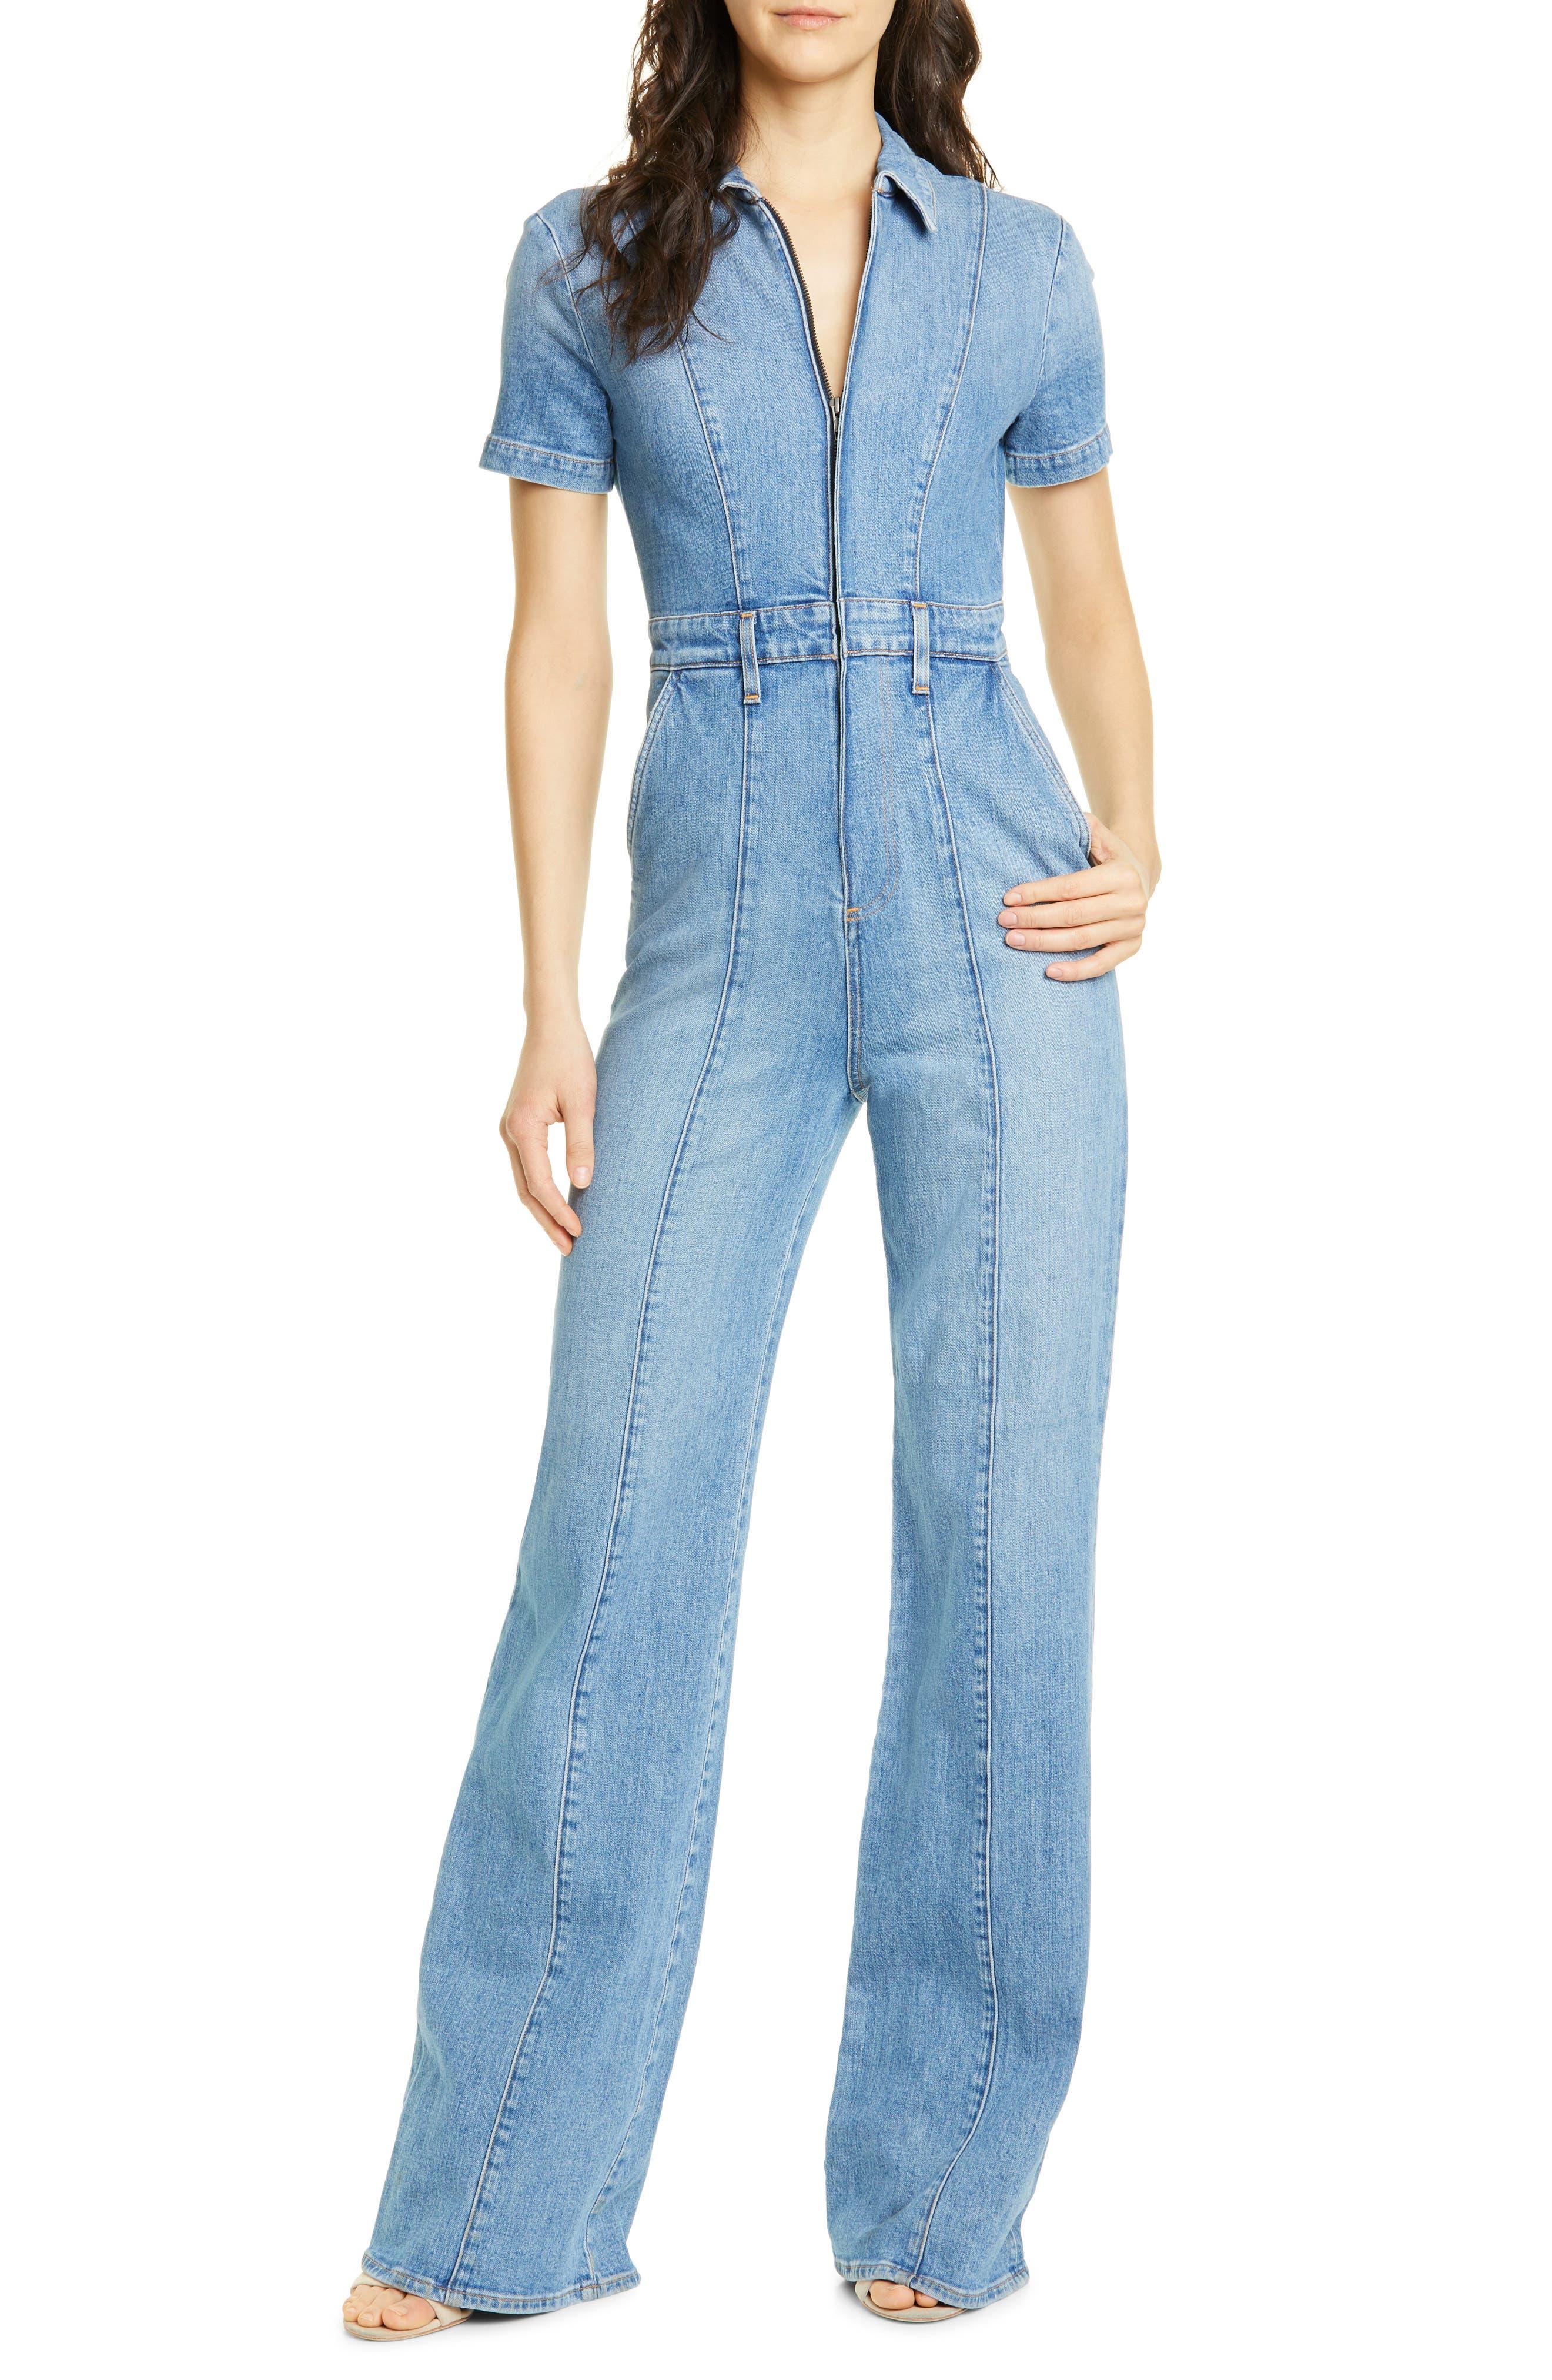 70s Jumpsuit | Disco Jumpsuits – Sequin, Striped, Gold, White, Black Womens Alice  Olivia Jeans Wide Leg Denim Jumpsuit $495.00 AT vintagedancer.com